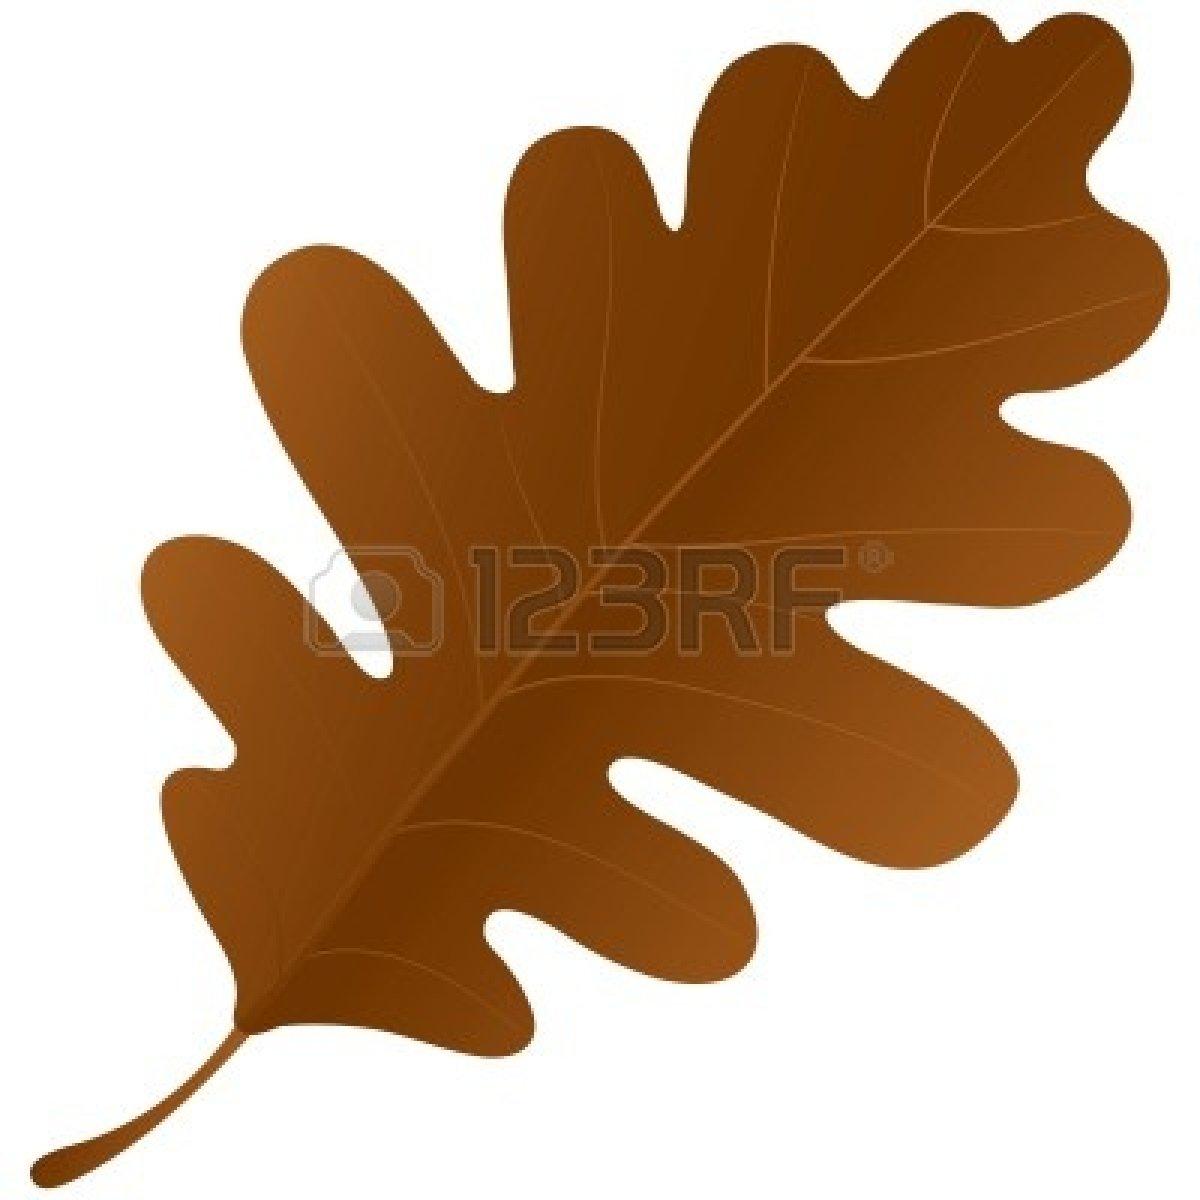 1200x1200 Fall Leaf Silhouette Clipart